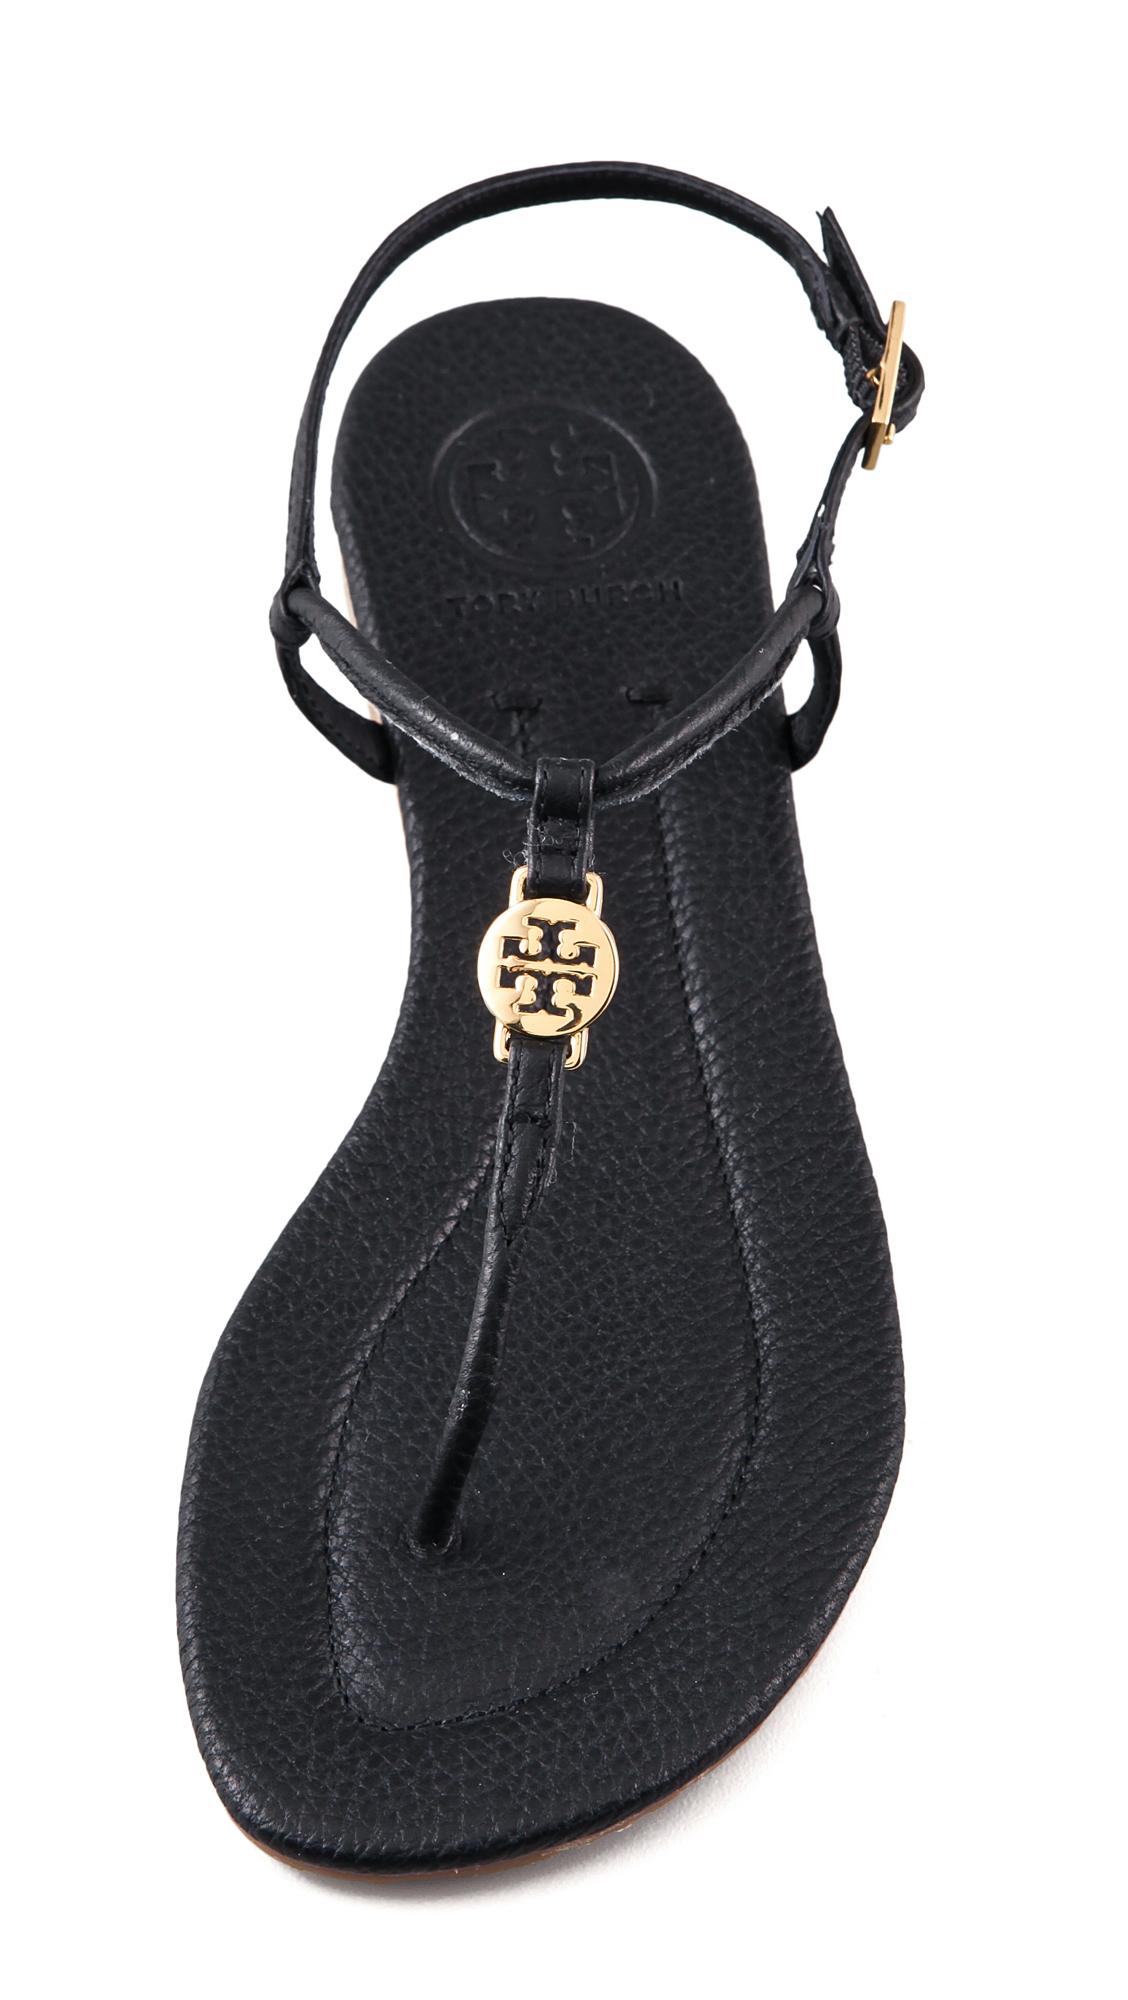 fe0a15365 Lyst - Tory Burch Emmy Flat Thong Sandals in Black